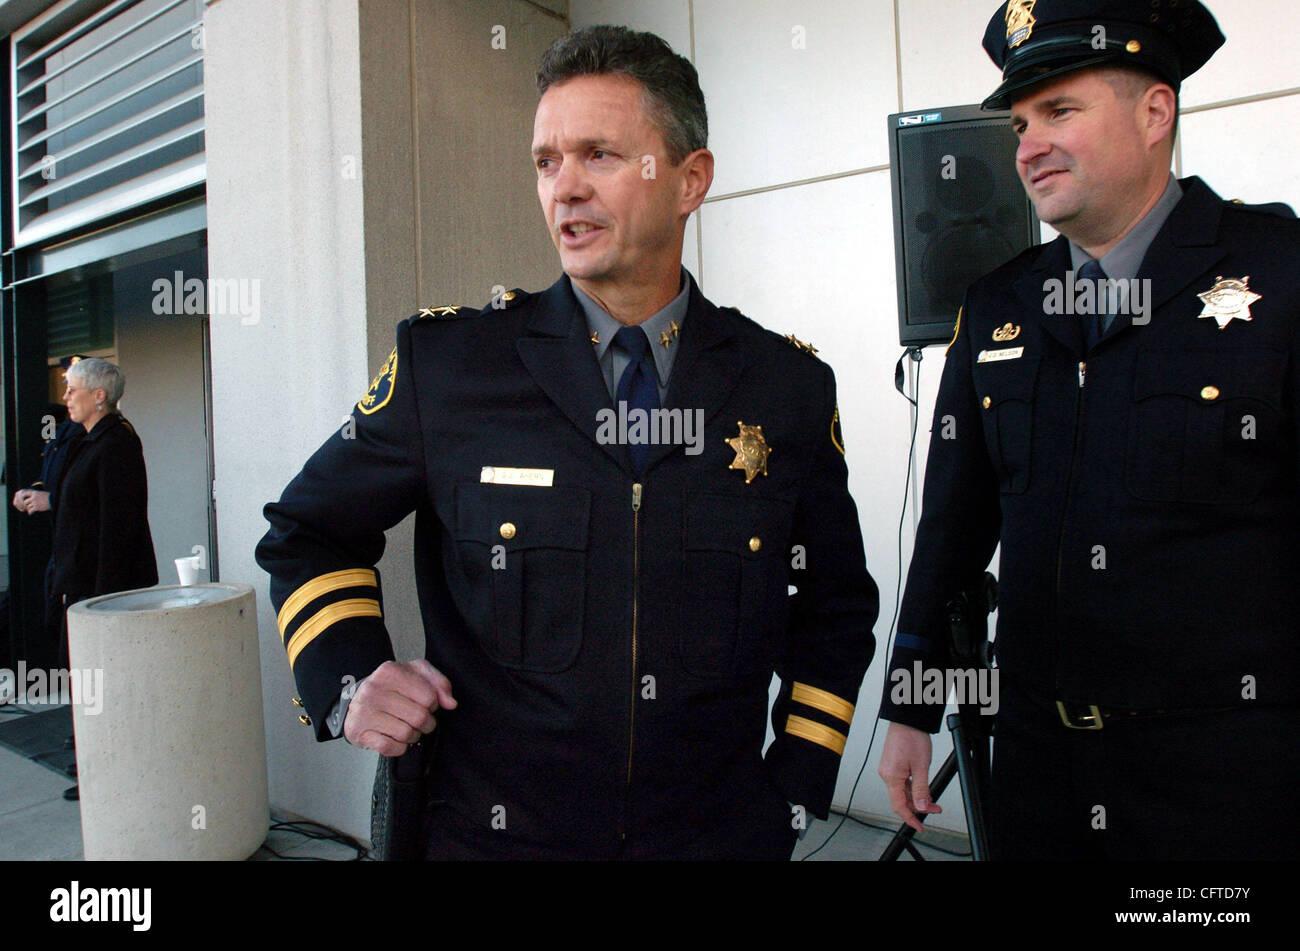 Incoming Alameda County Sheriff Greg Ahern (left) was one